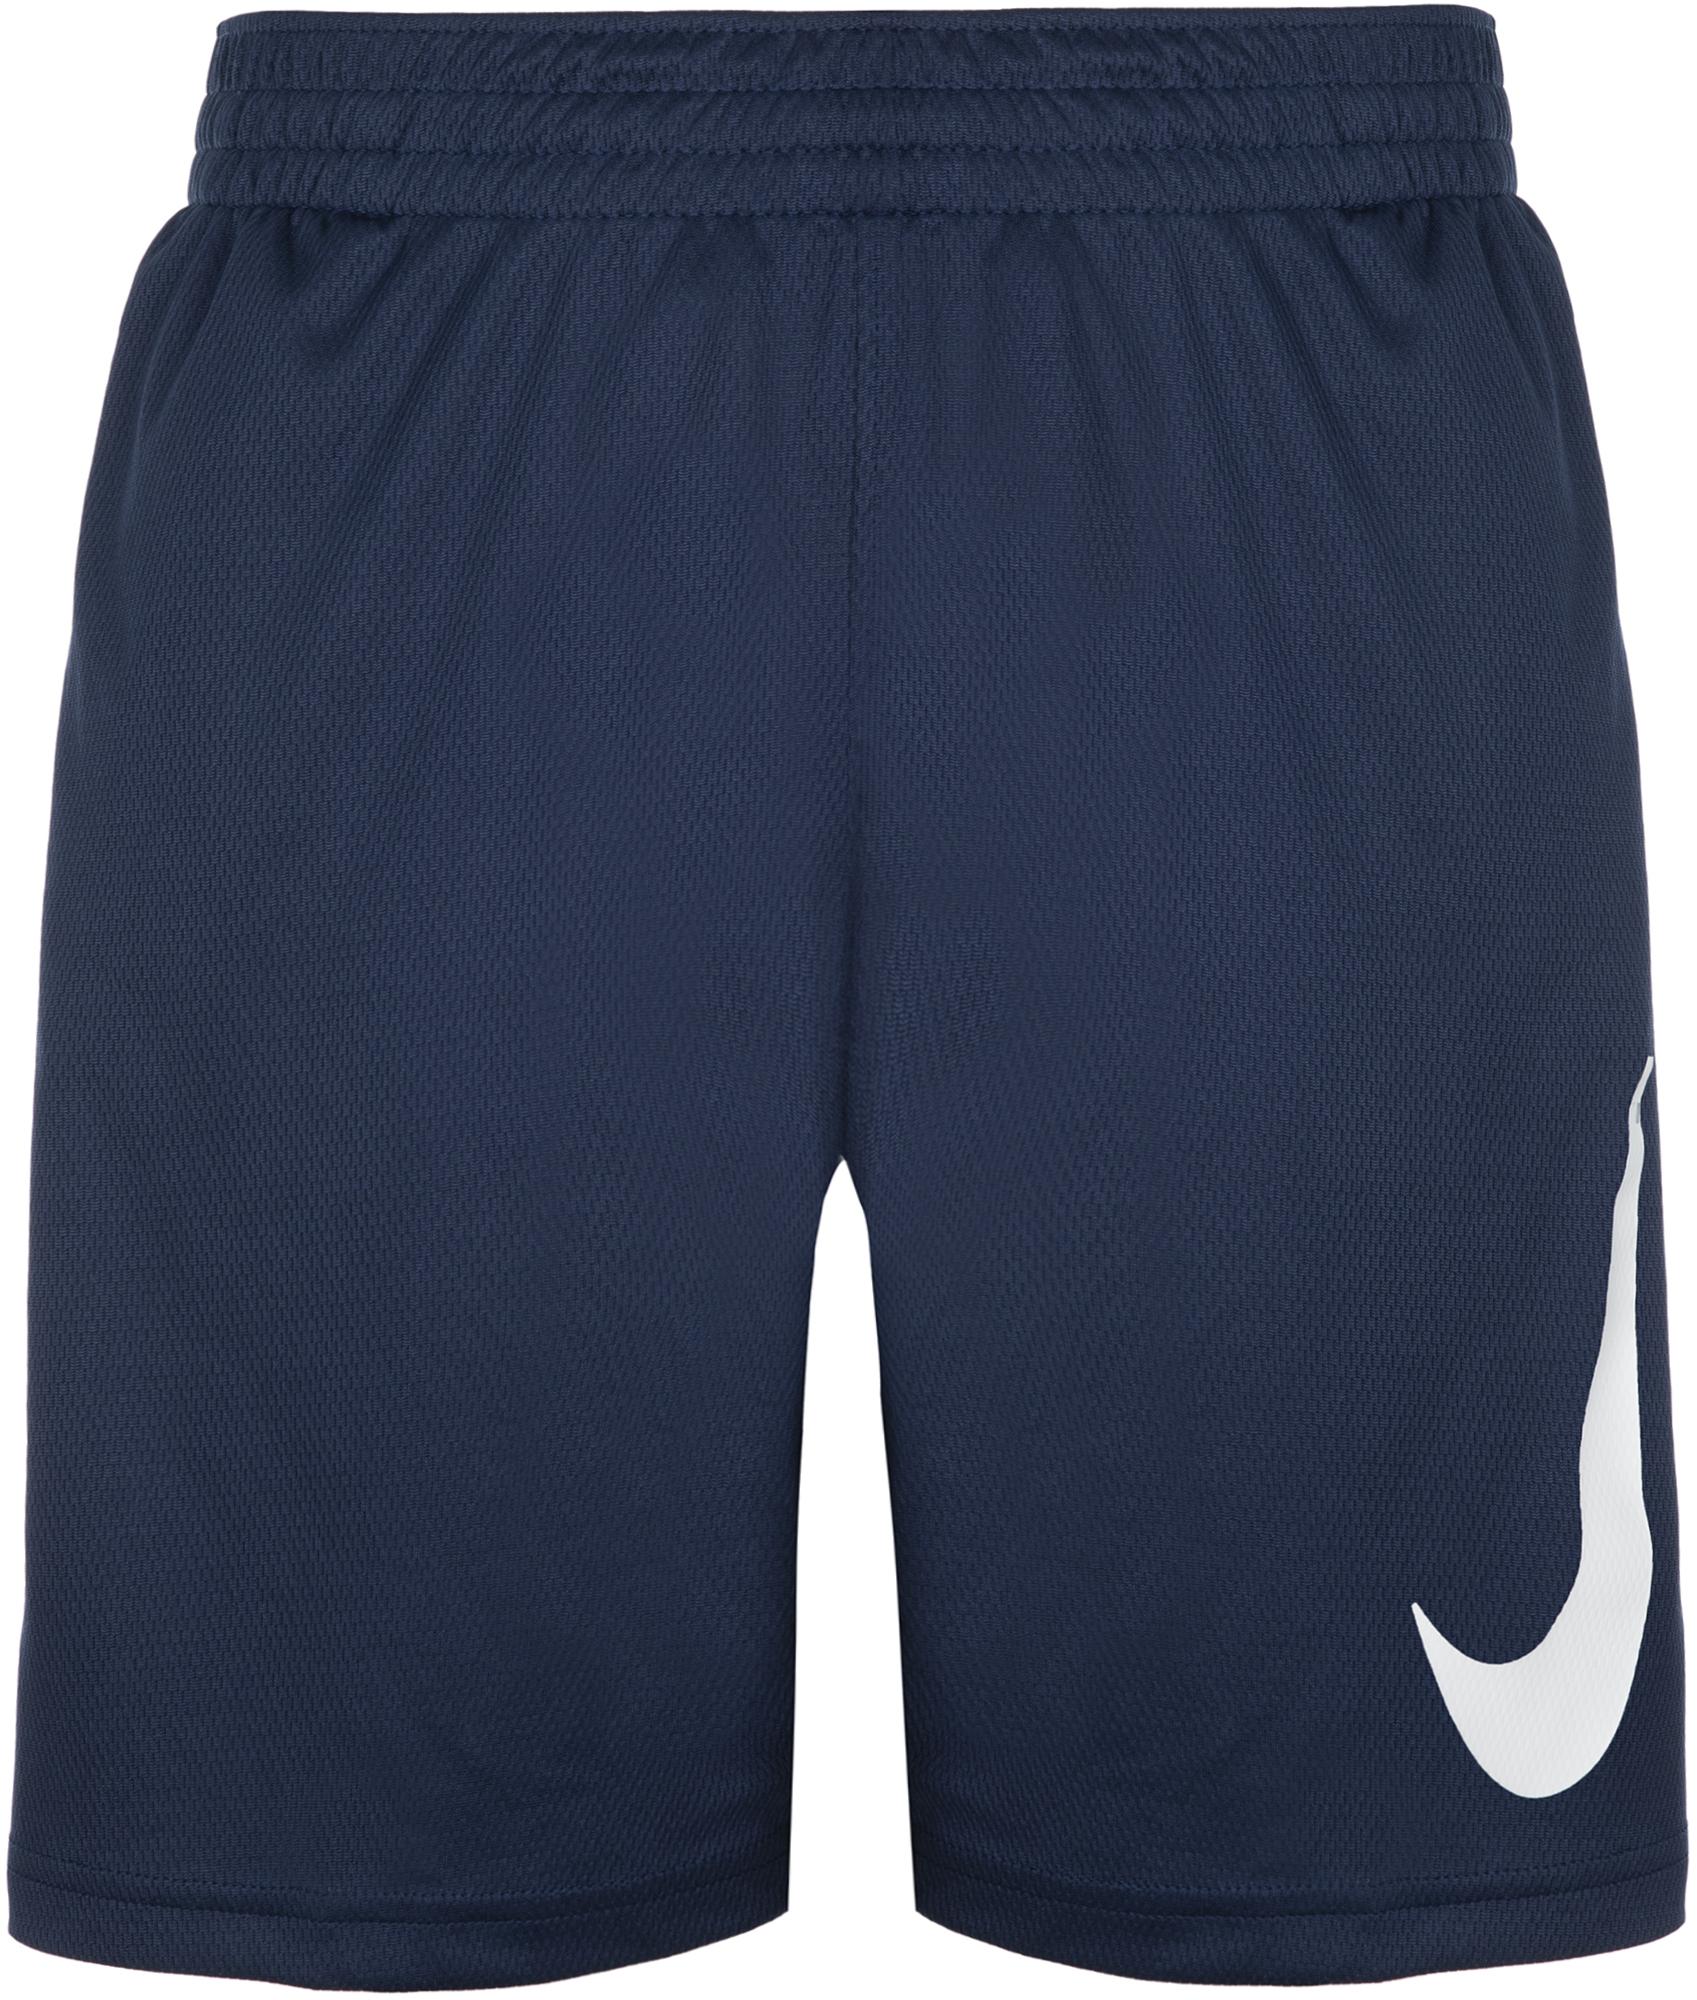 Nike Шорты для мальчиков Dry, размер 158-170